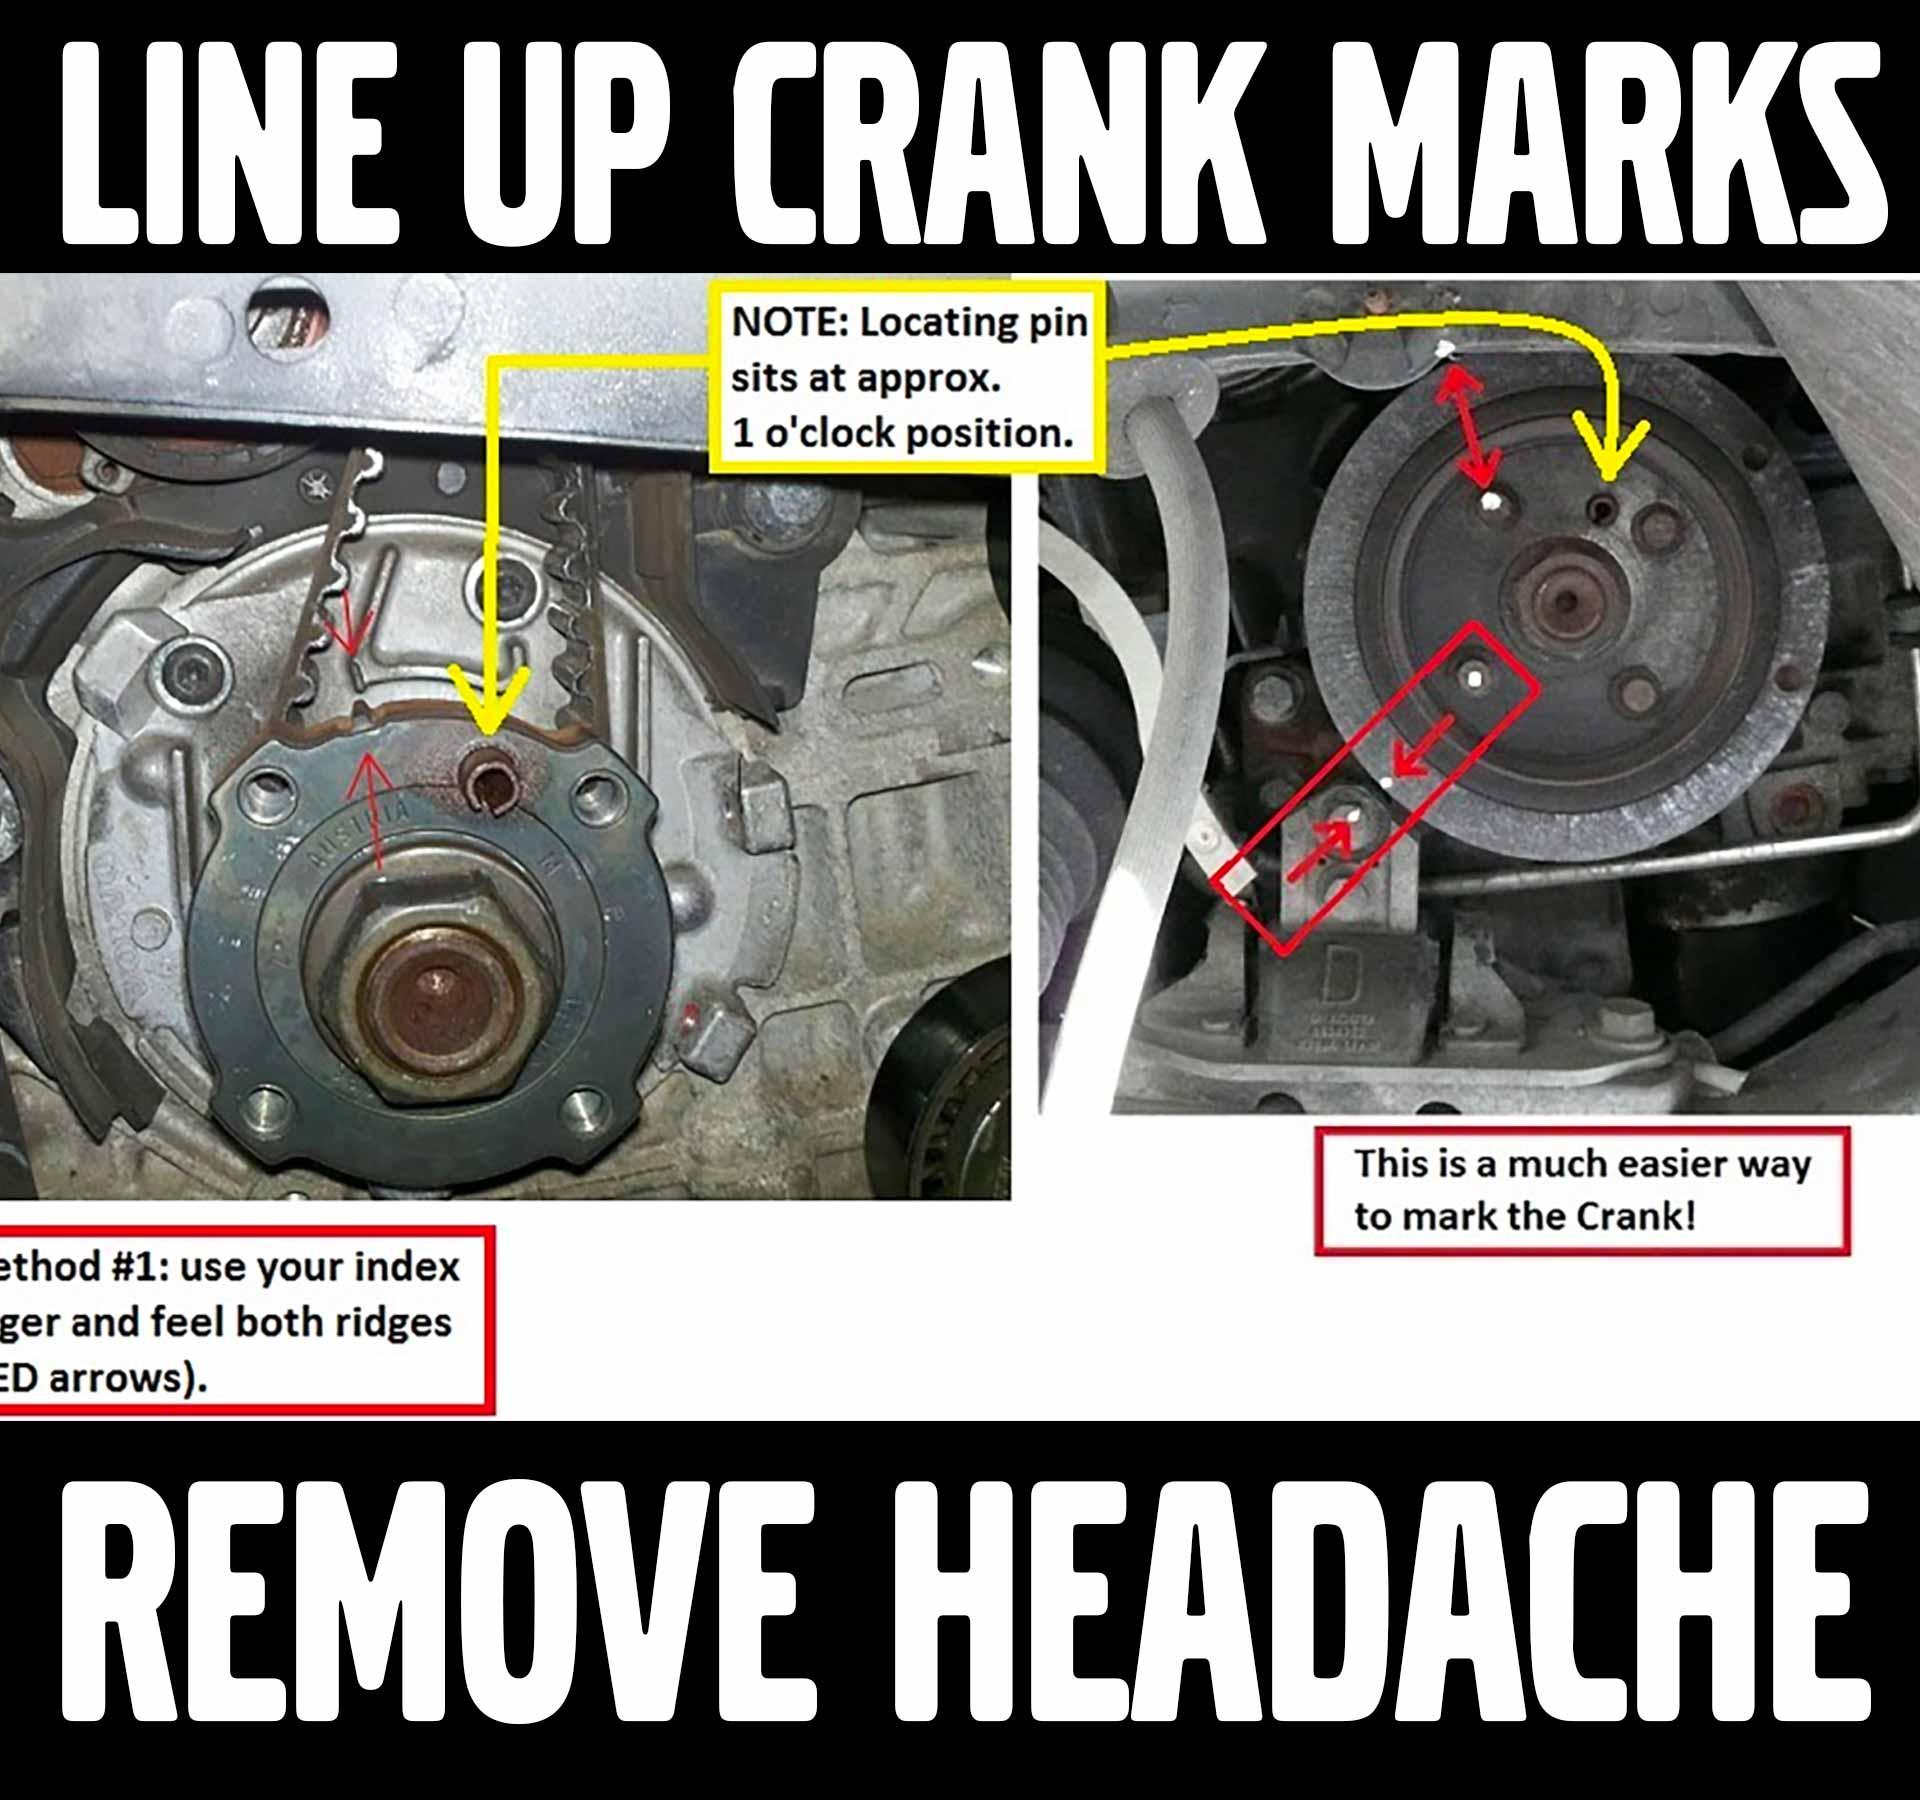 Line Up Crank Marks